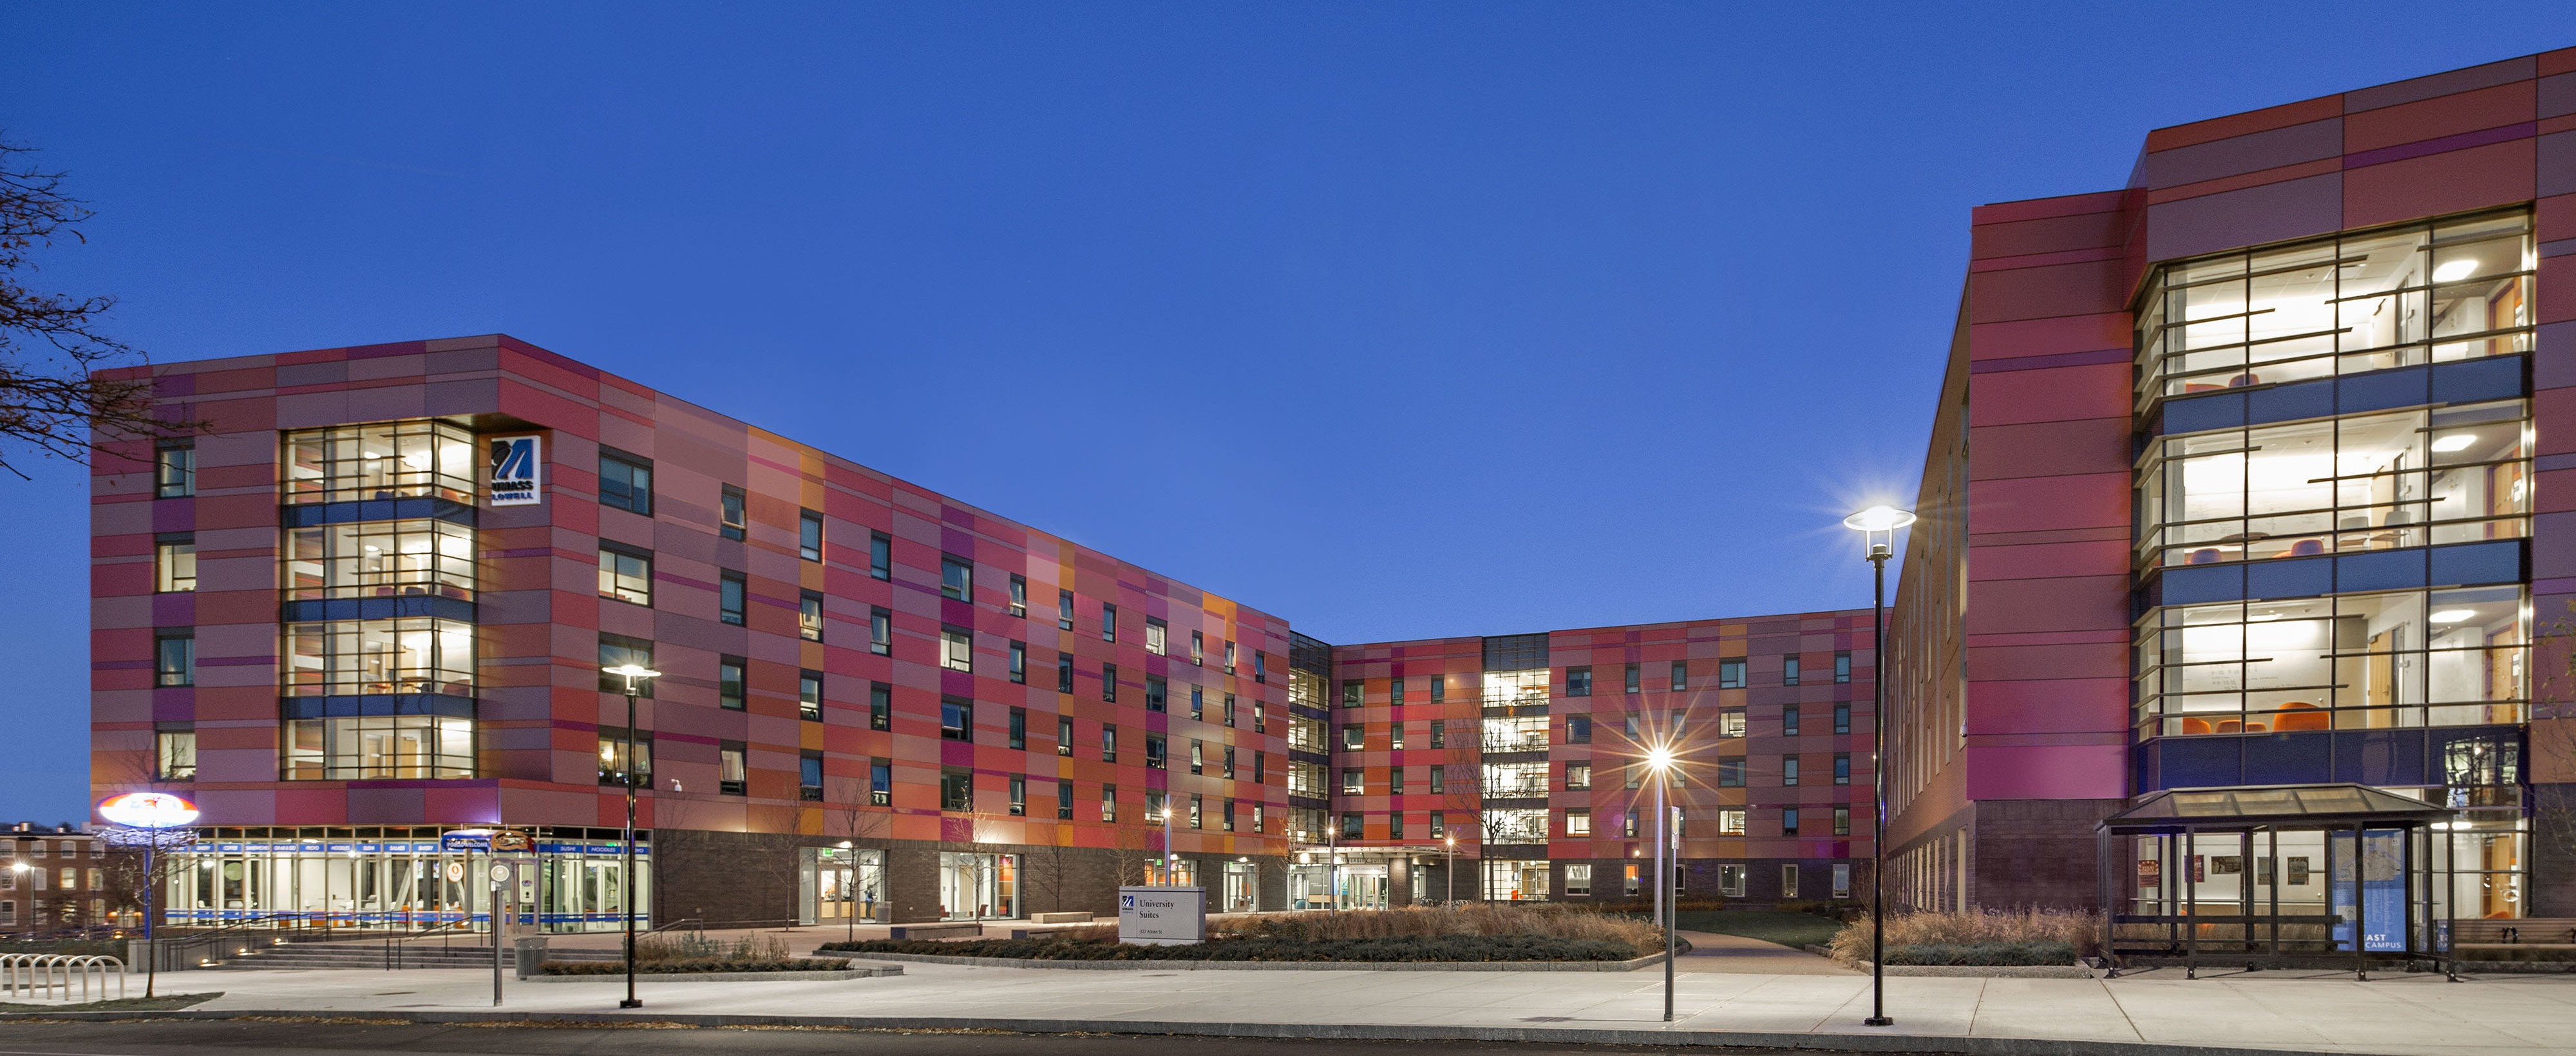 UMass Lowell University Suites